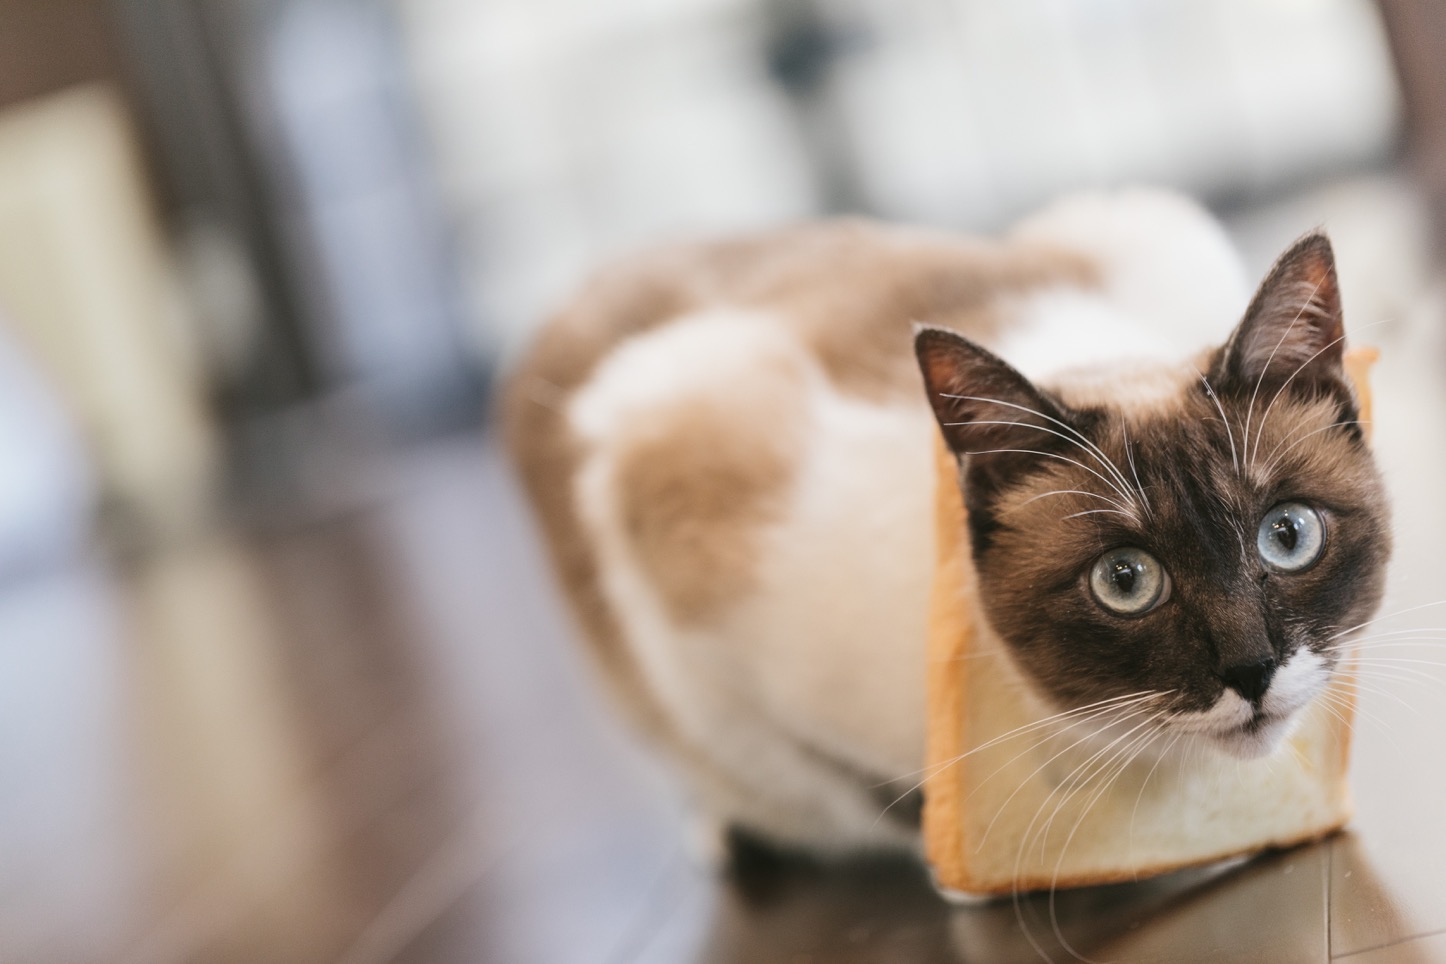 Crown Cat 猫のフリー写真素材 from ぱくたそ